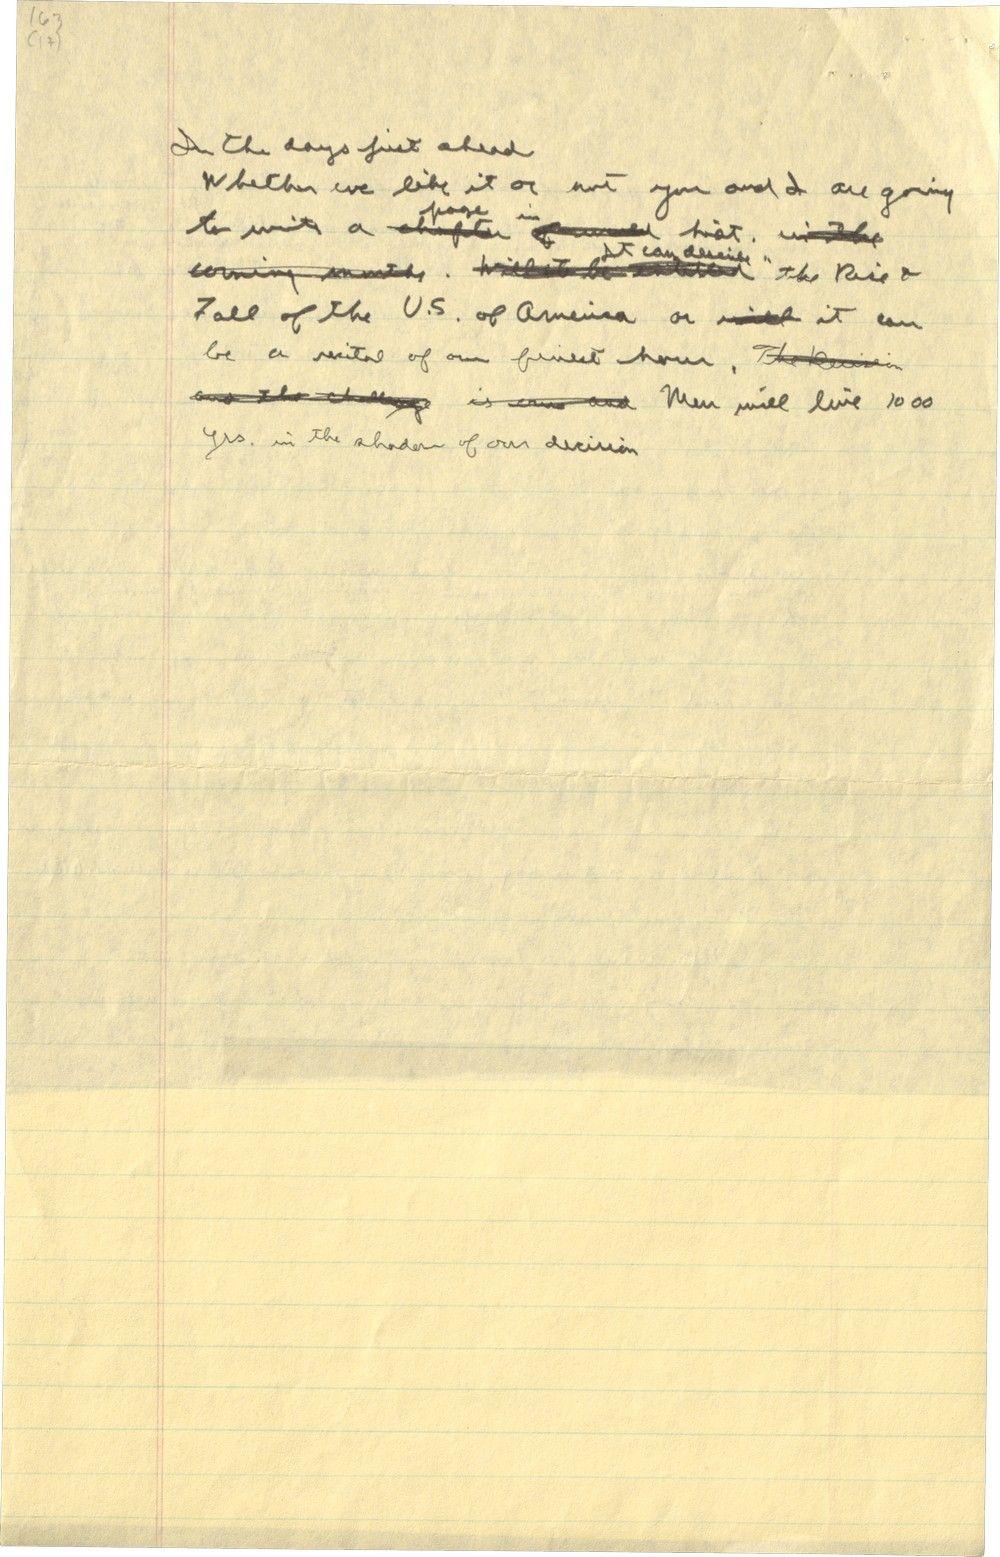 Page 19 transcript